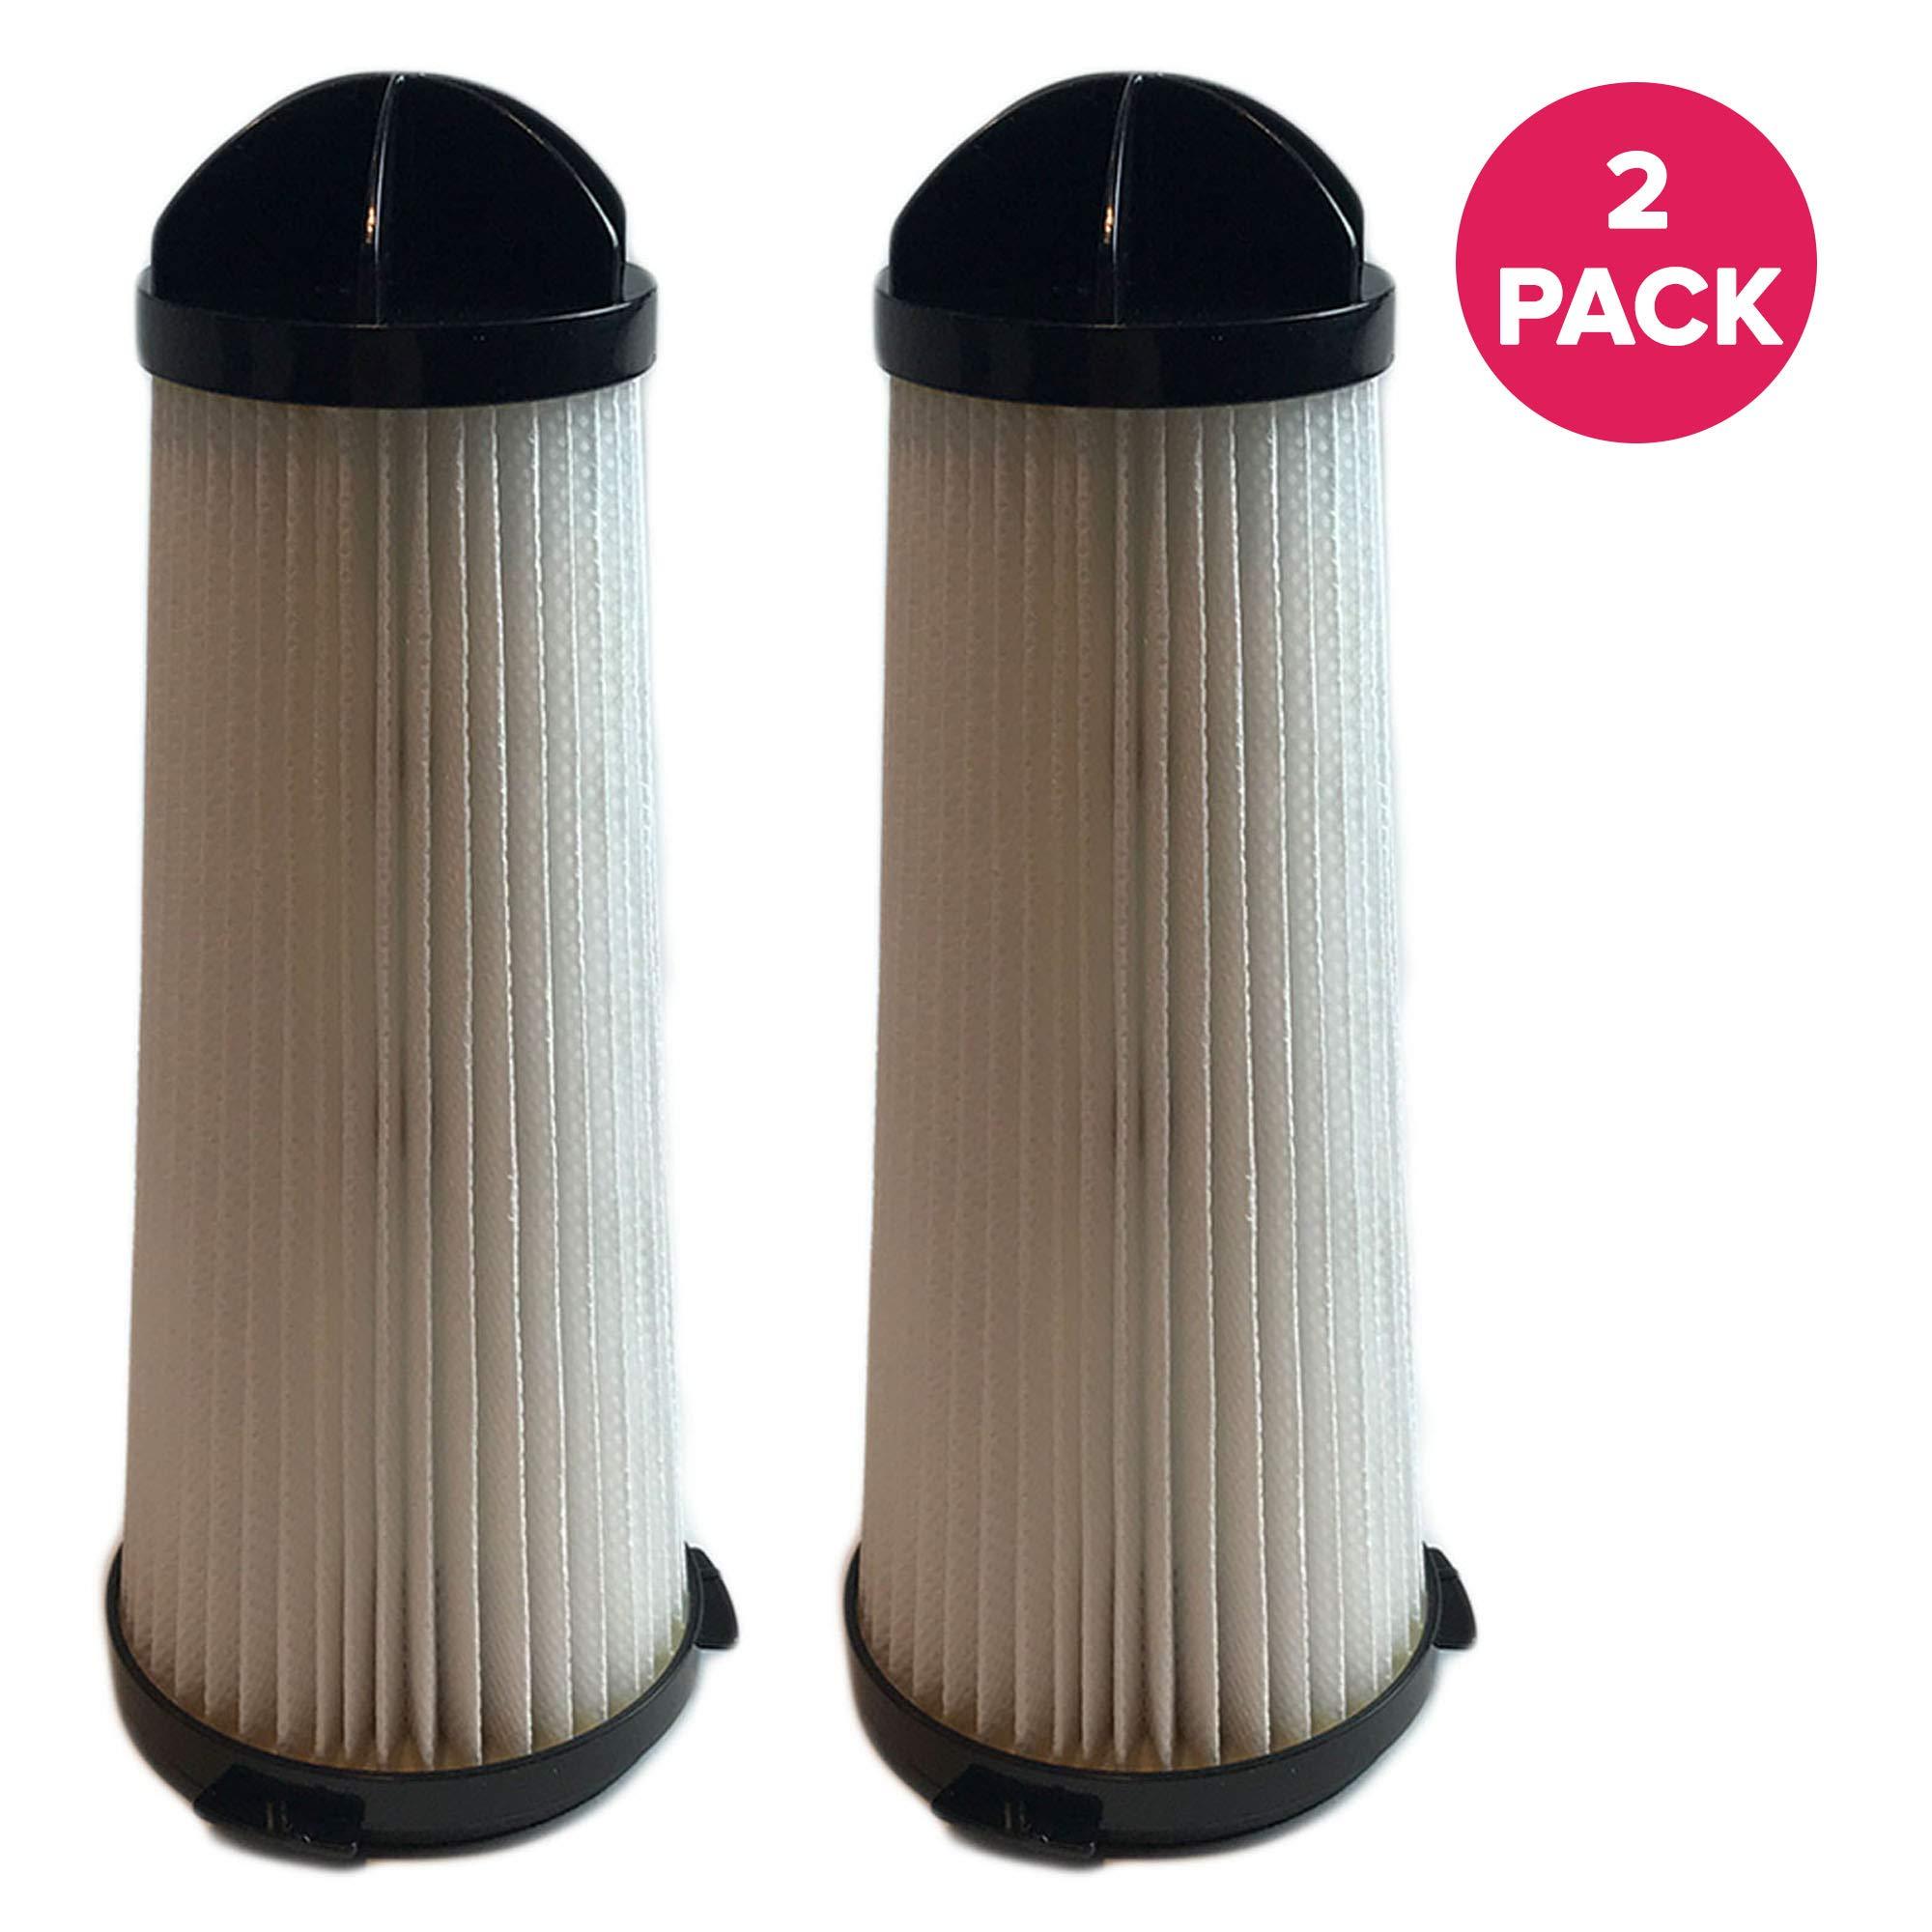 Crucial Vacuum Replacement Vacuum Filter Compatible With Hoover Backpack Vac & Shoulder Vac - Pair with HEPA Style Part 2KE2110000, 2-KE2110000, 2- KE2110-000, 7.5'' x 3.1'' x 3.1'' - Bulk (2 Pack) by Crucial Vacuum